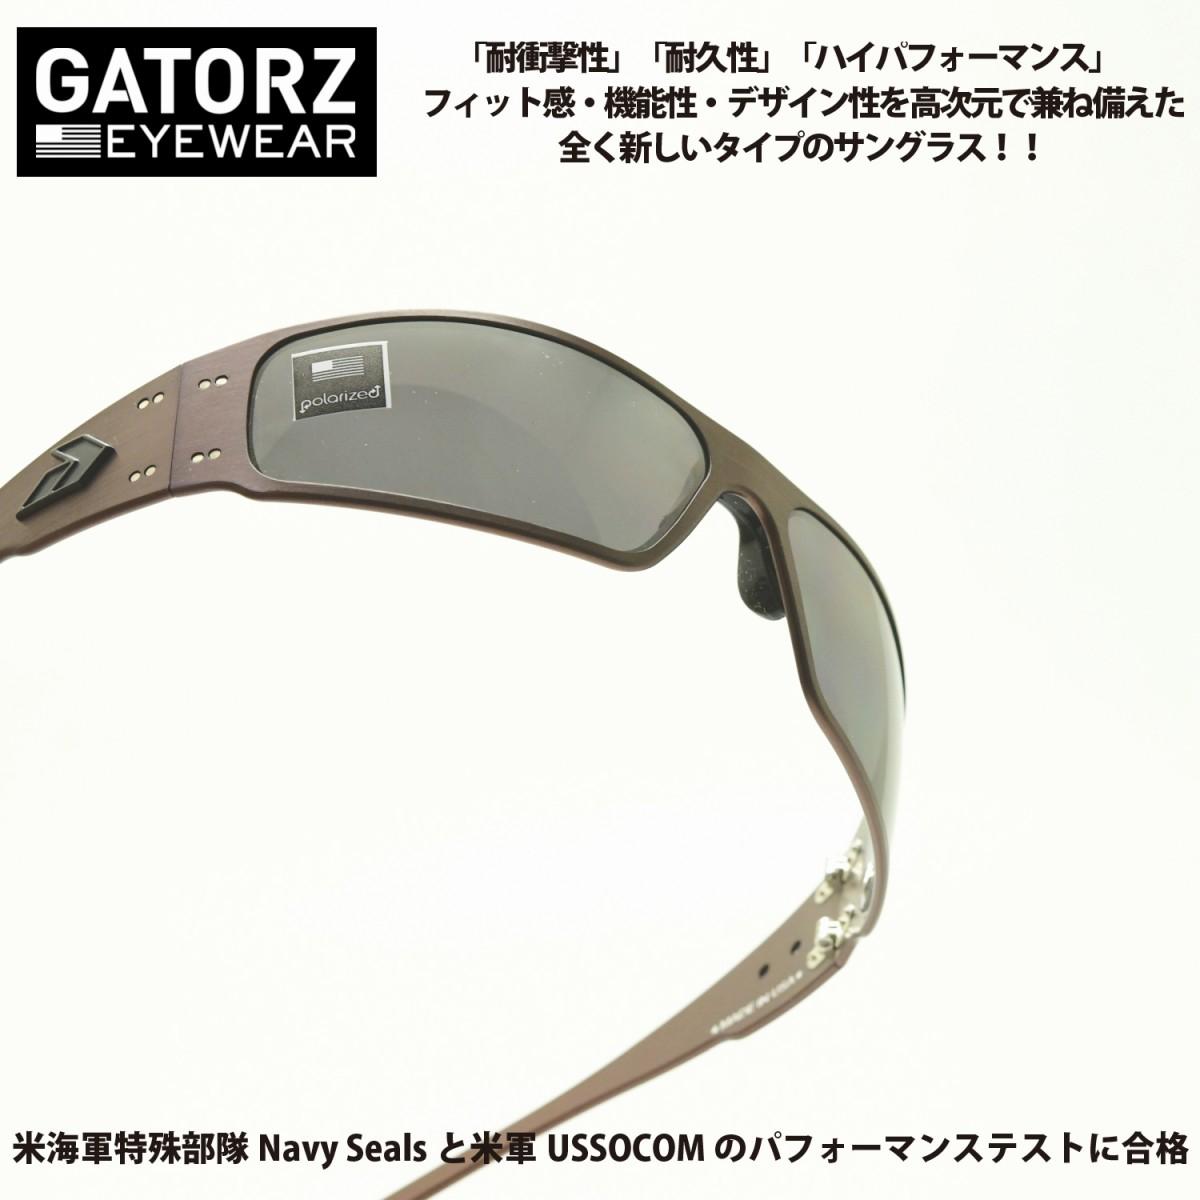 GATORZ ゲイターズMAGNUM マグナム(TACTICAL COPPER/SMOKE POLA)